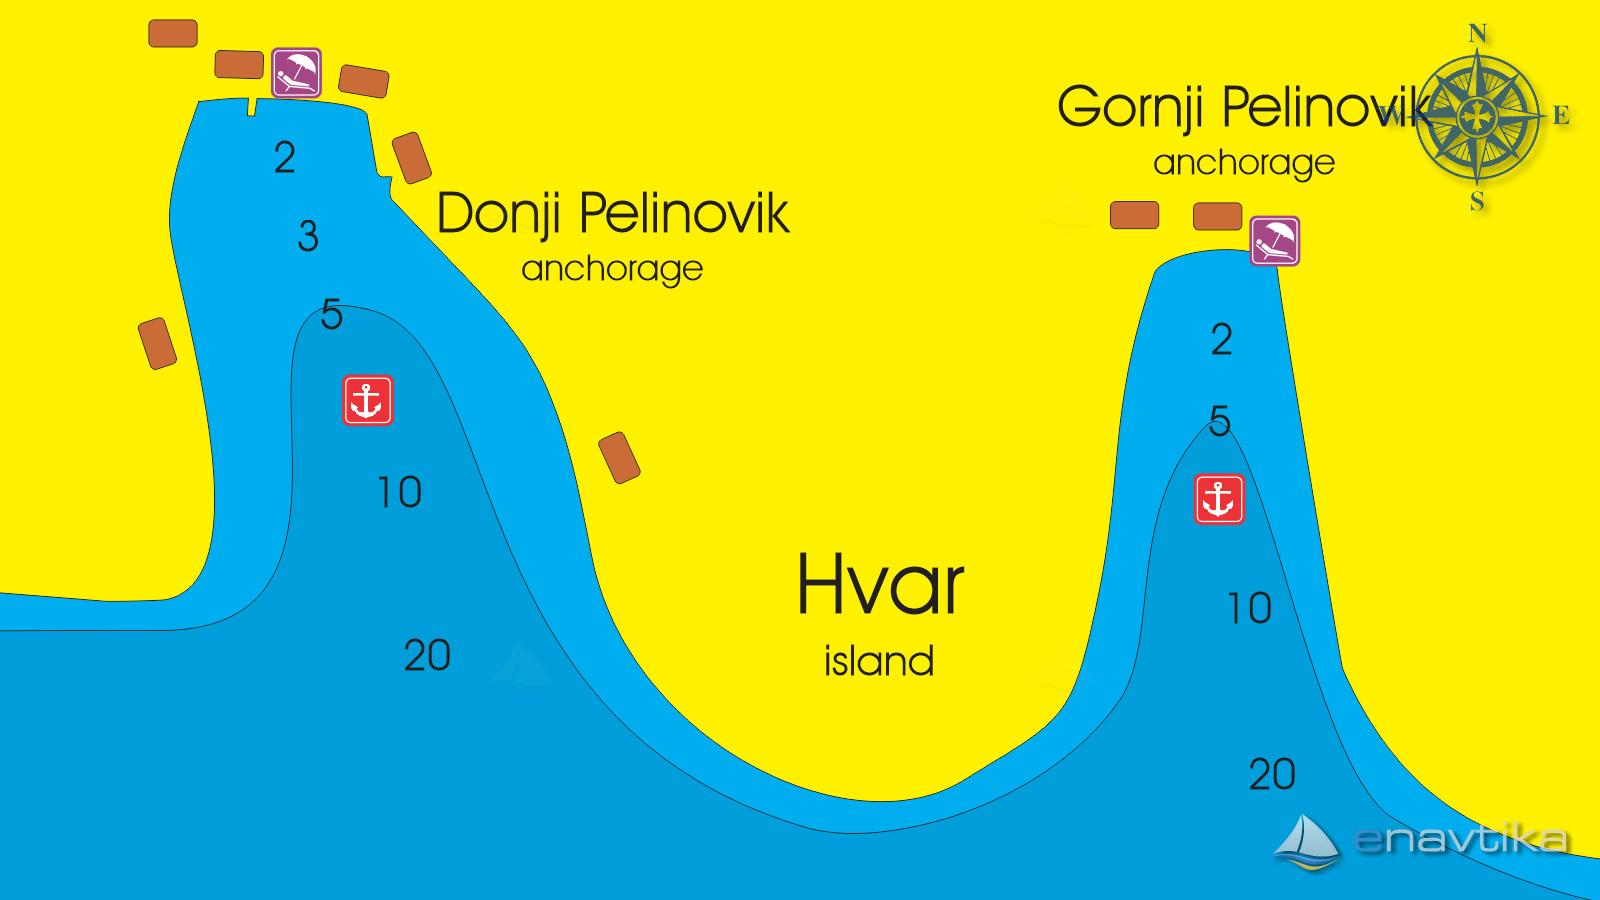 Slika Gornji Pelinovik 2